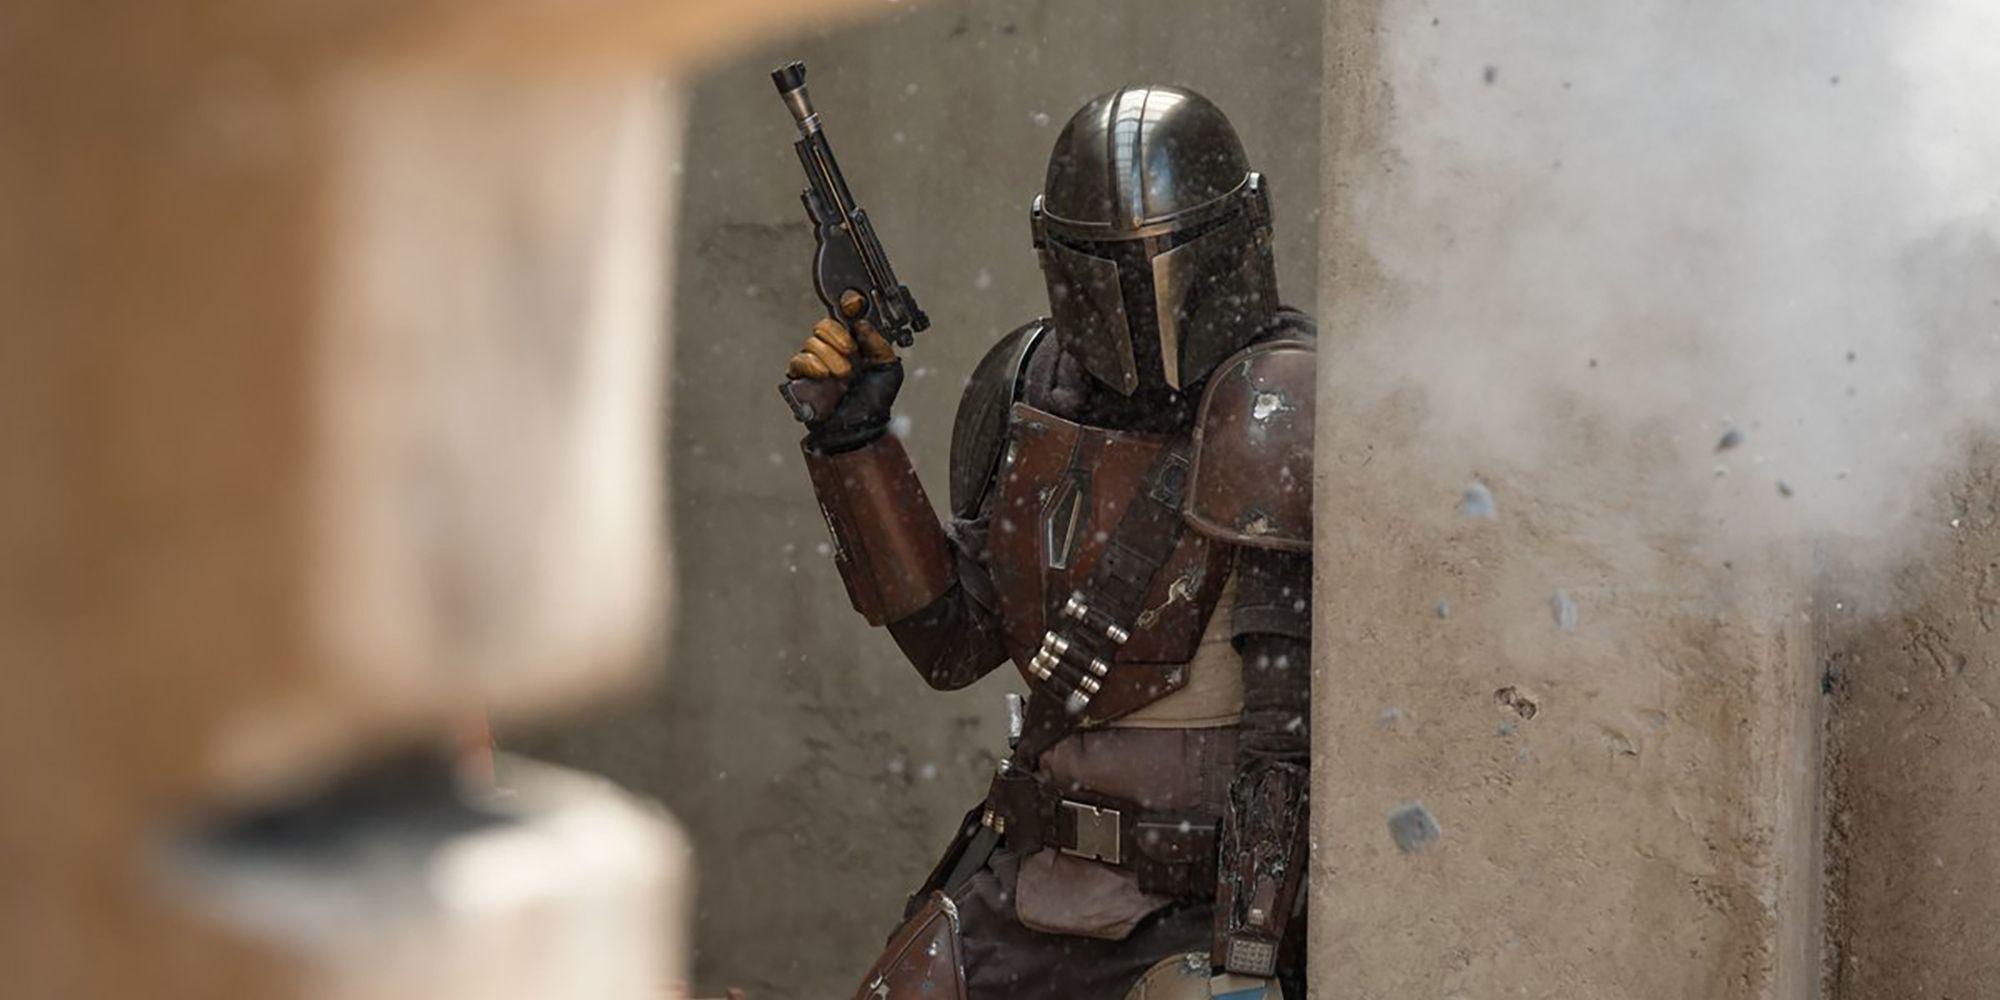 The Mandalorian: Favreau Confirms Star Wars Show's Release Schedule